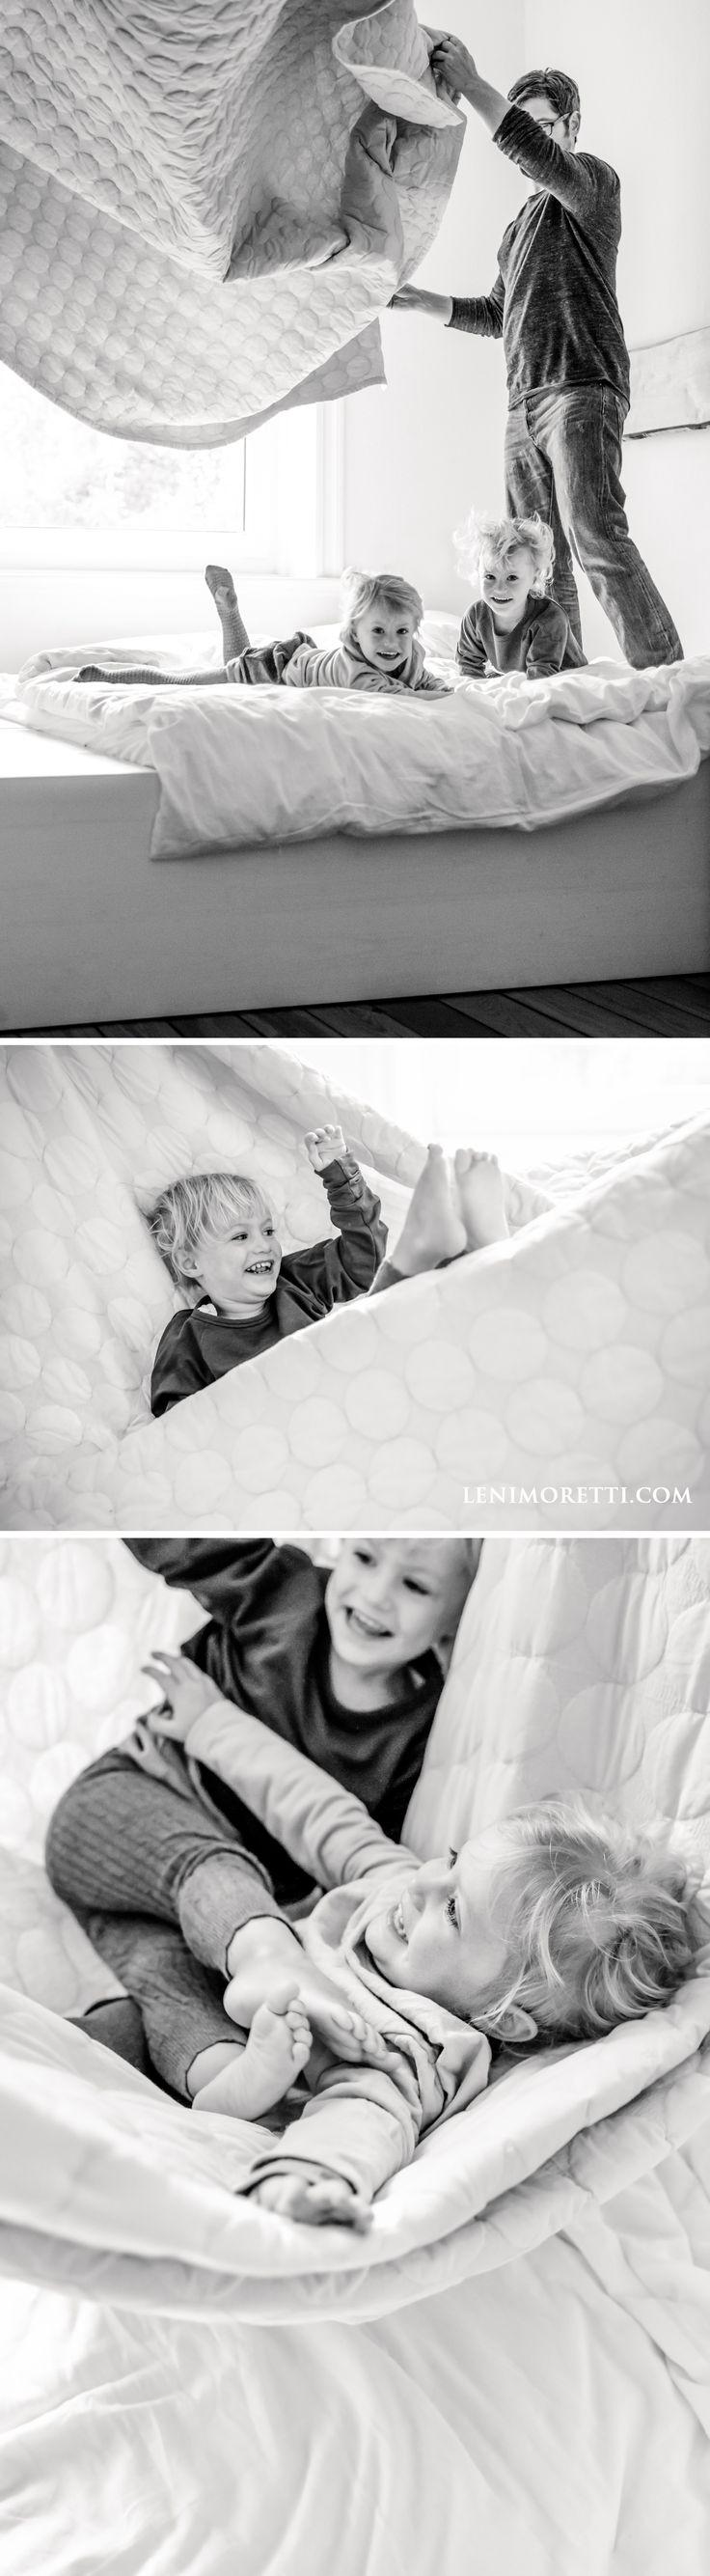 Kreative Idee für Familienfotos im Bett mit Zwillingen ©️ lenimoretti.com